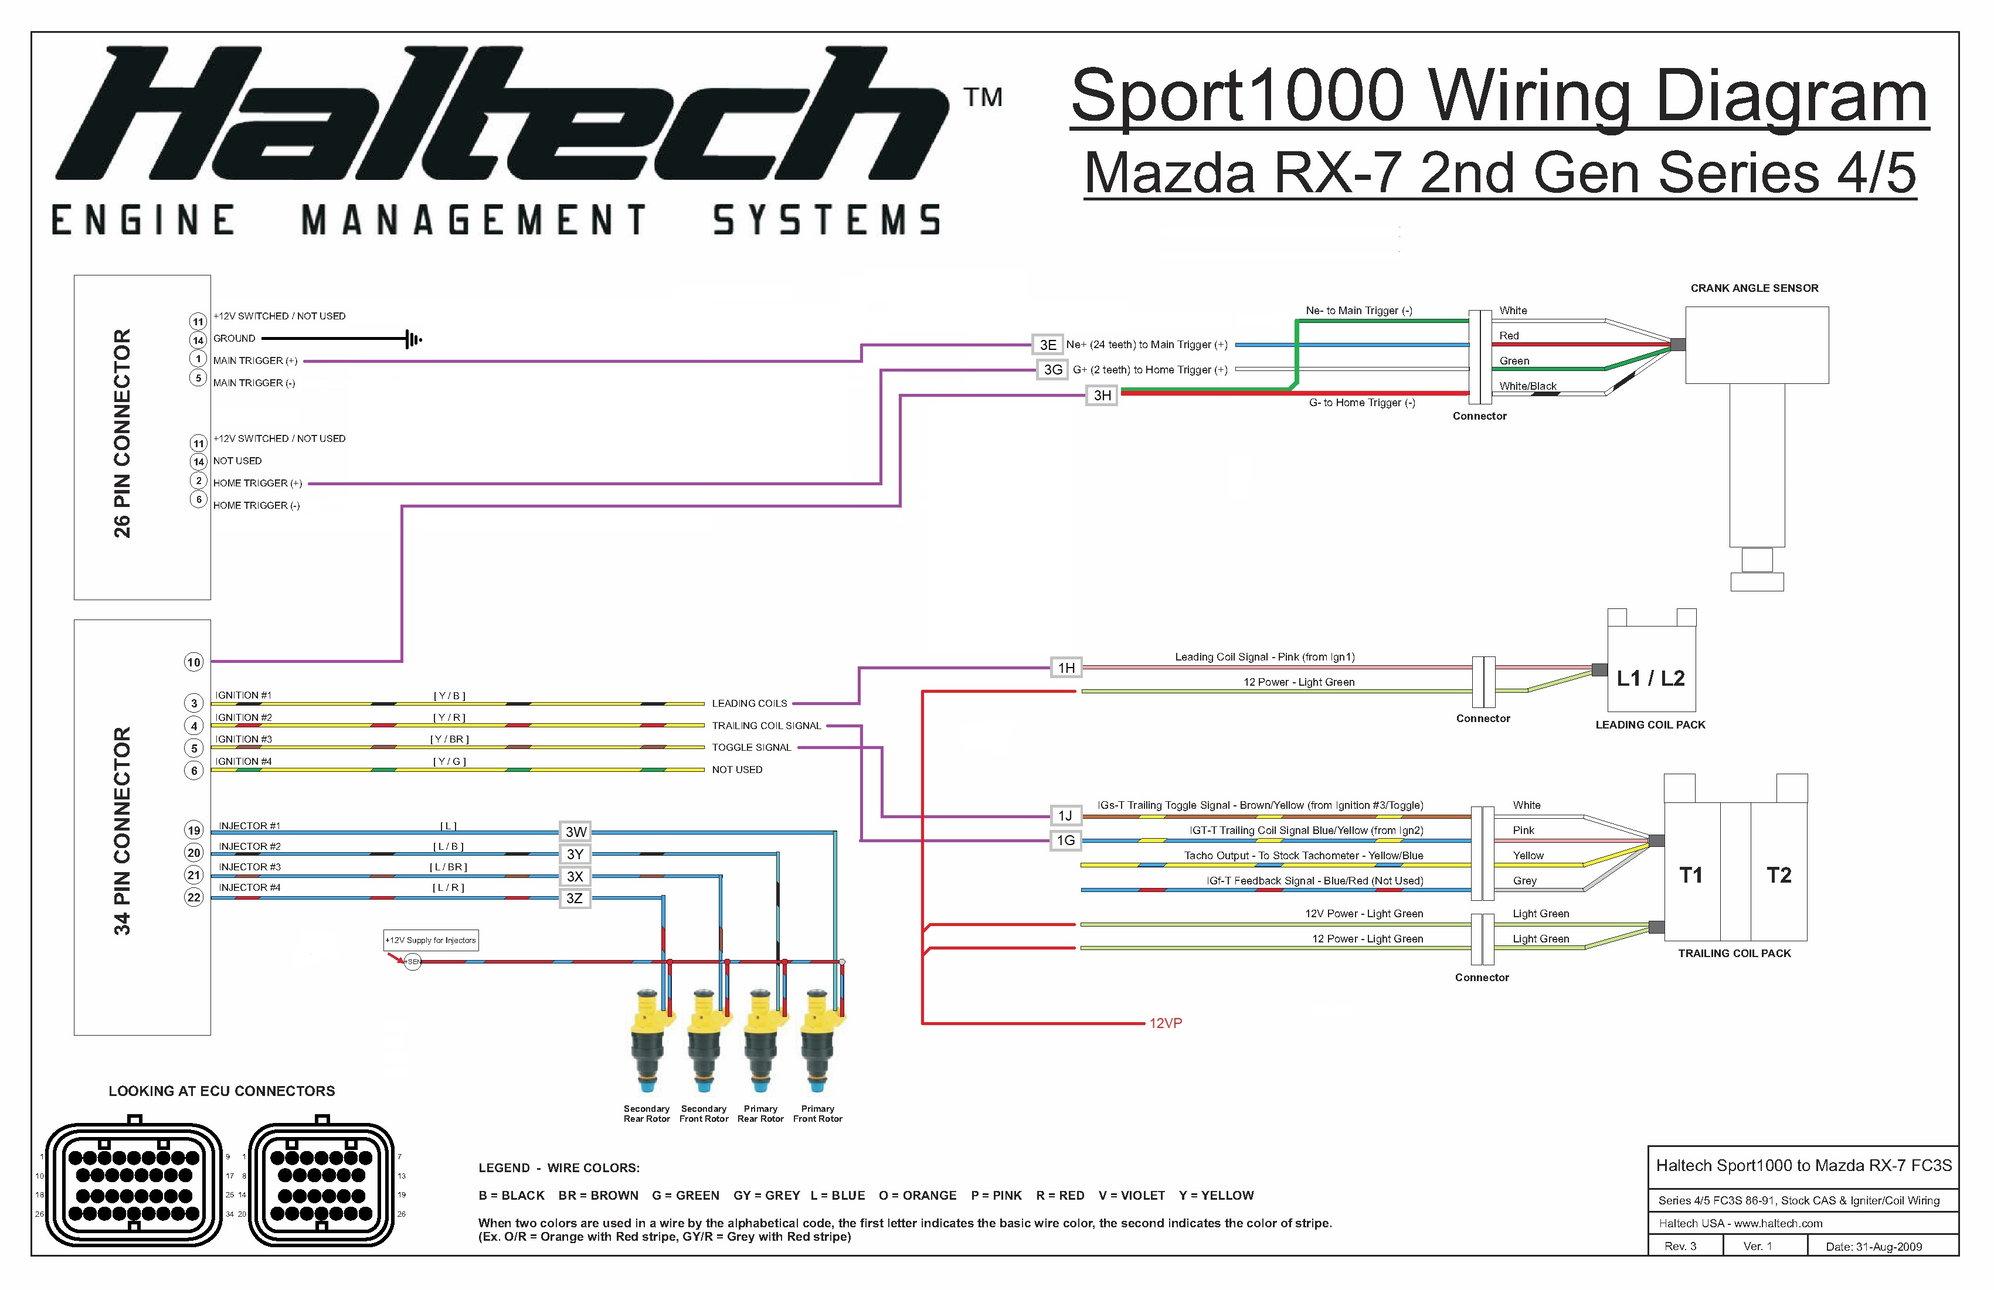 Haltech Wiring Diagram - Wiring Diagram Content on